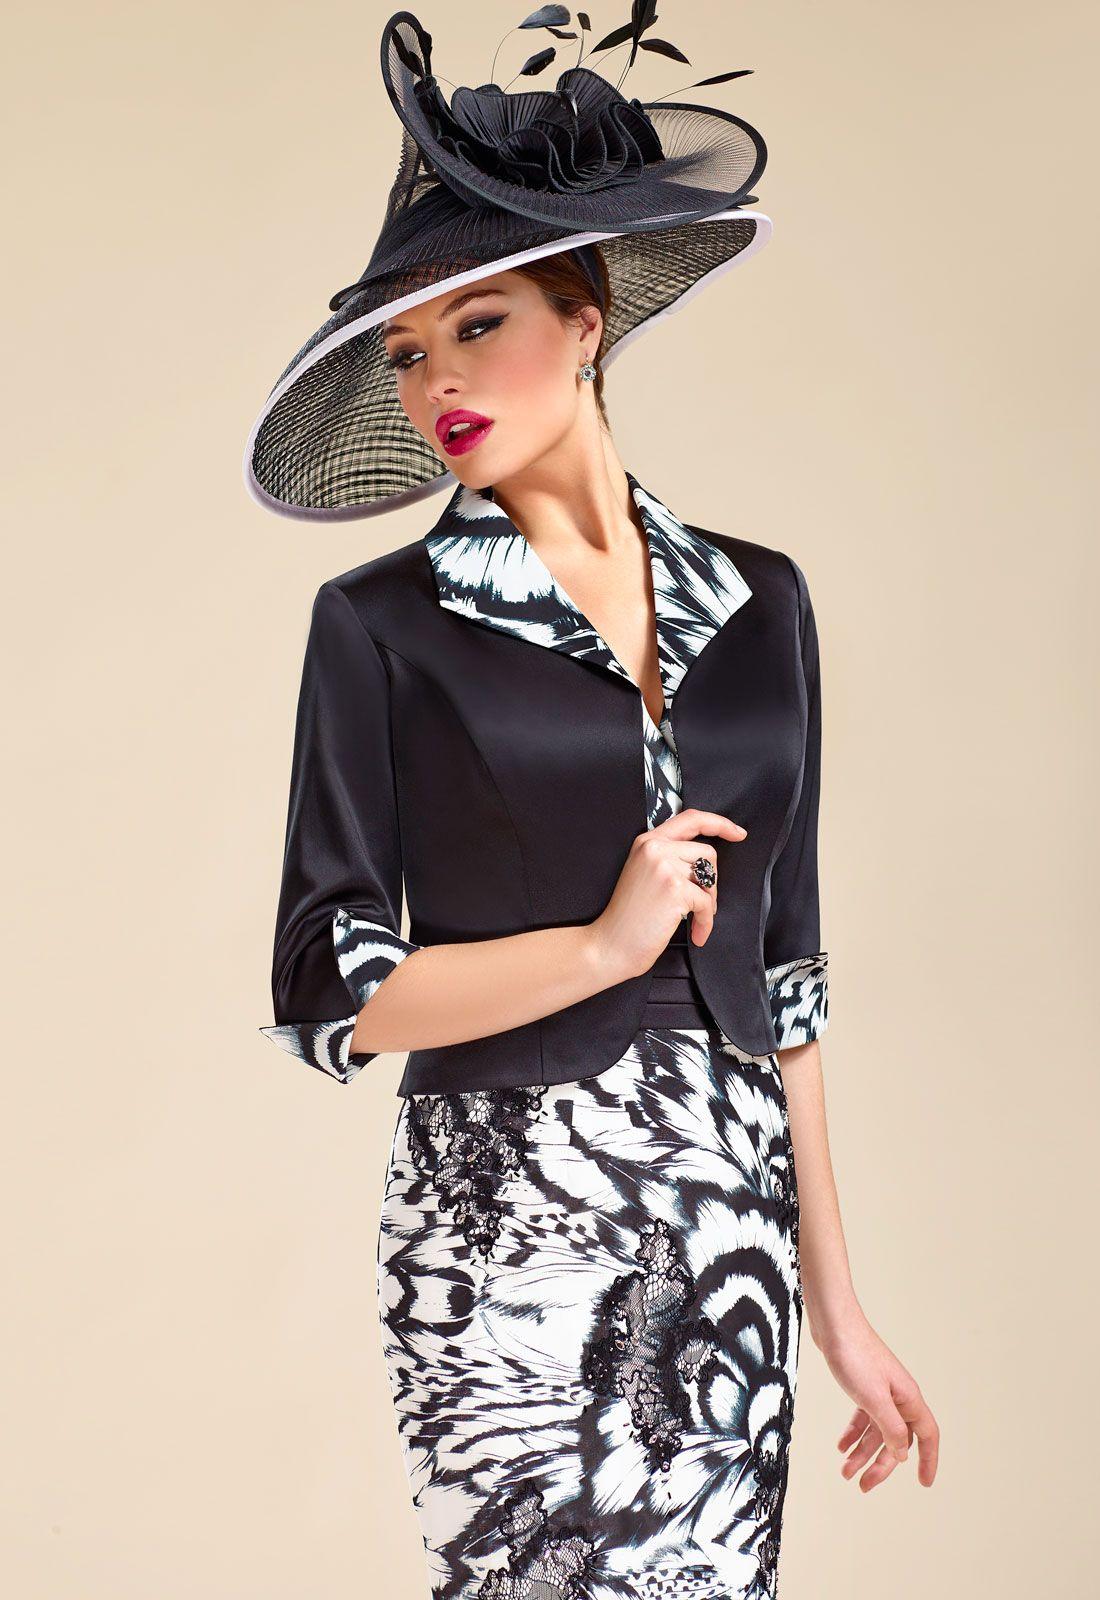 Zeila Donna Vestido Design Gn De Corto Group 8928 8xHqfwxUd